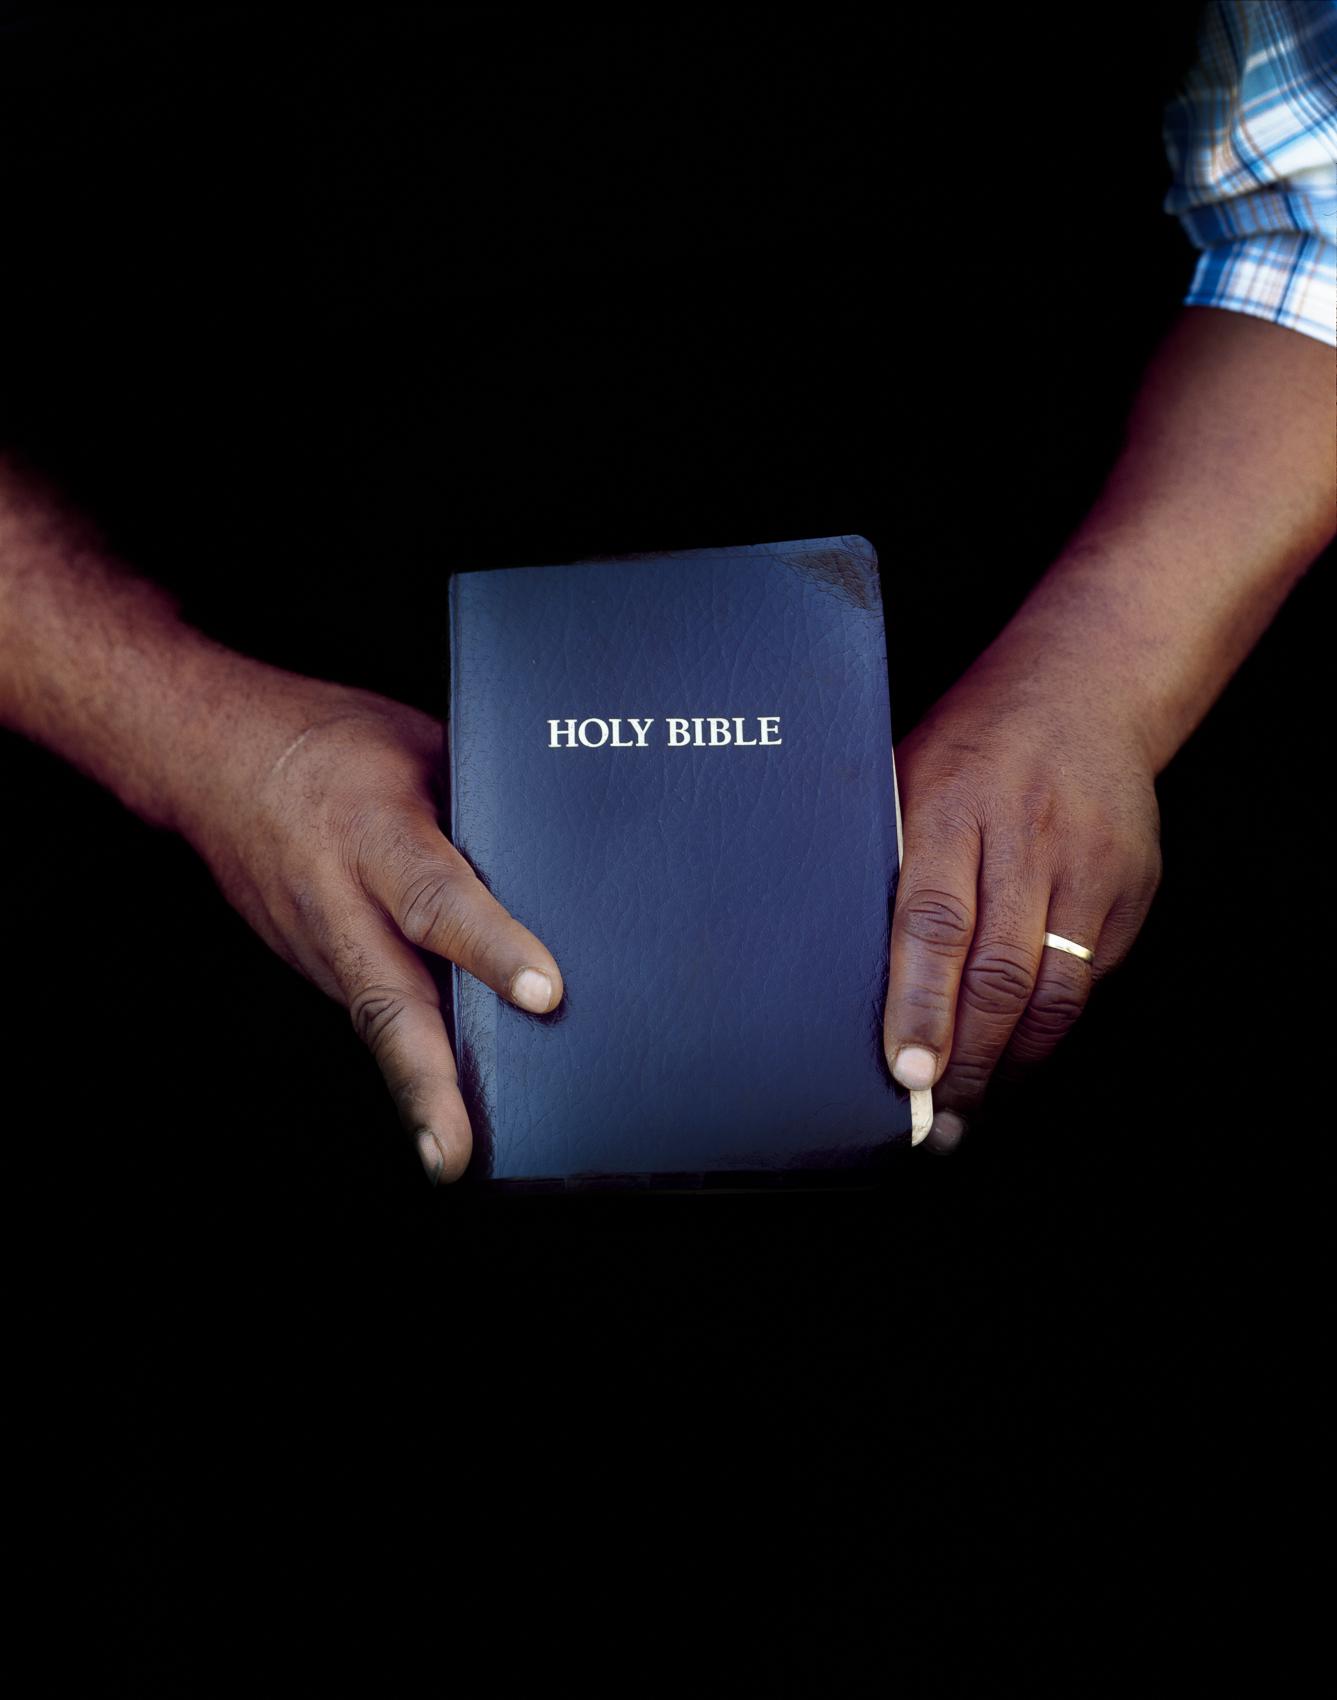 Shawn's Bible